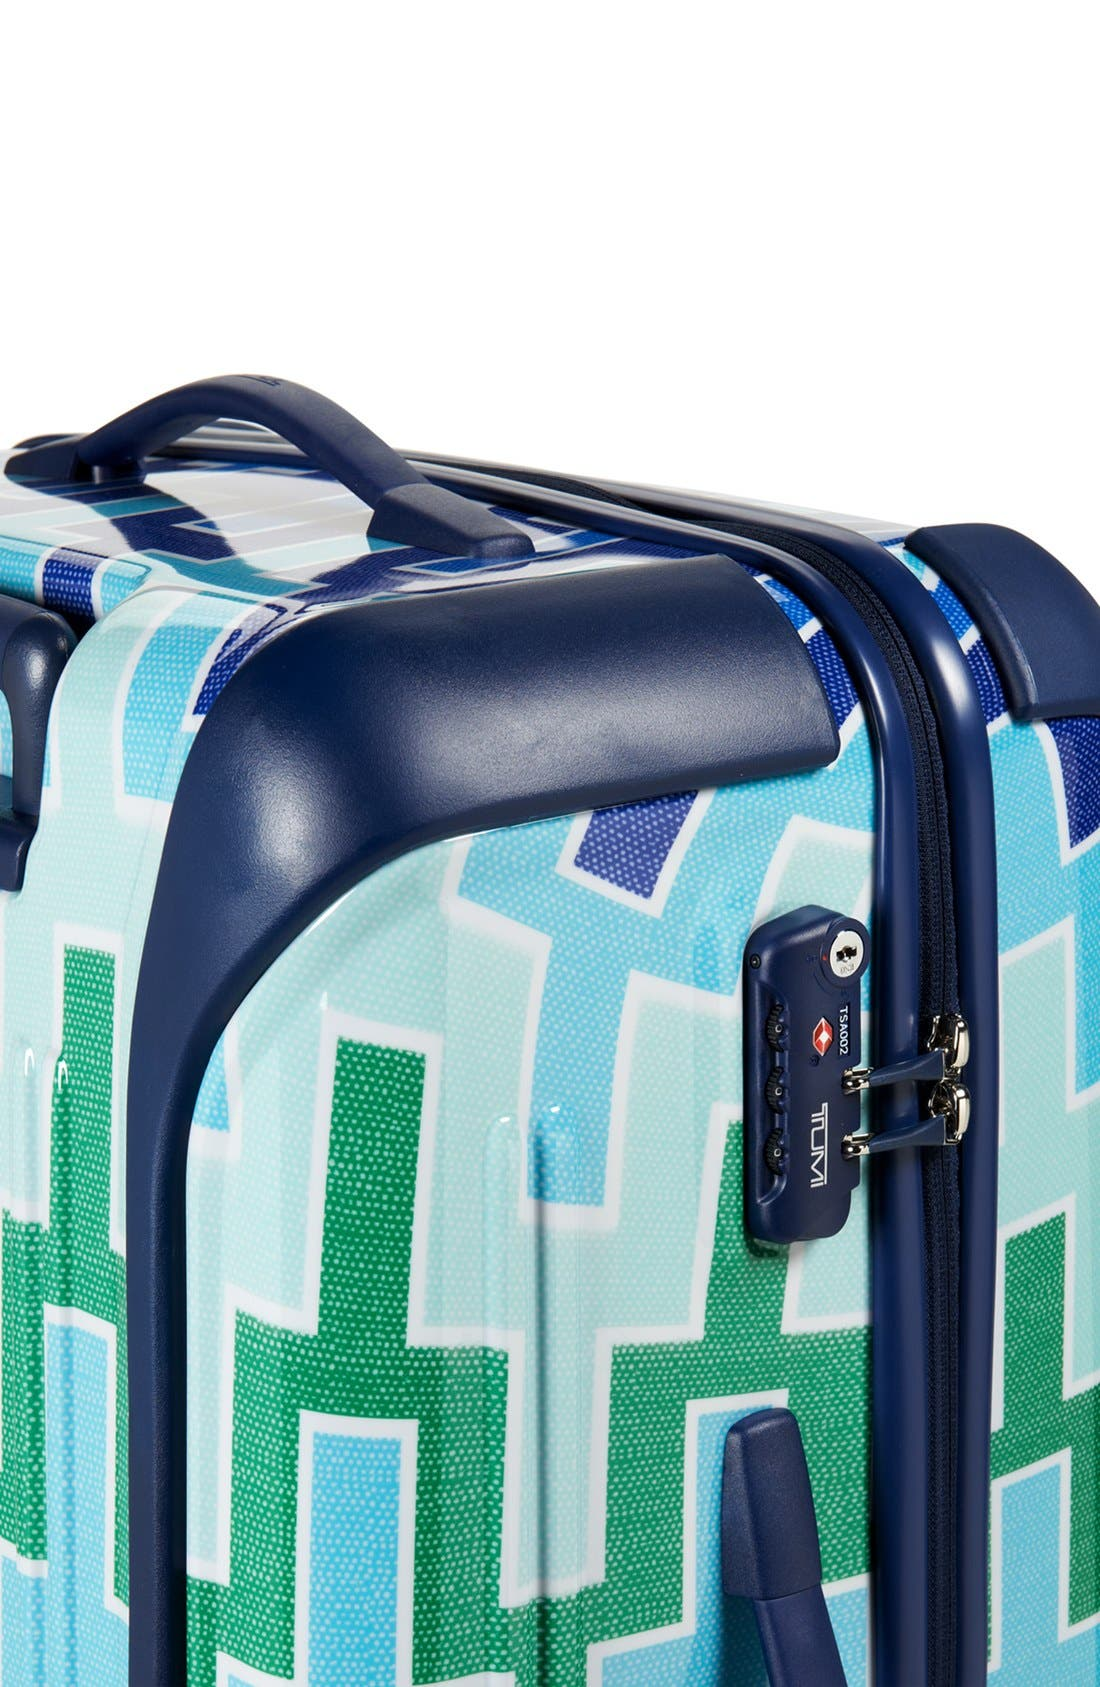 Alternate Image 4  - Tumi 'Vapor™ - Jonathan Adler' Medium Trip Packing Case